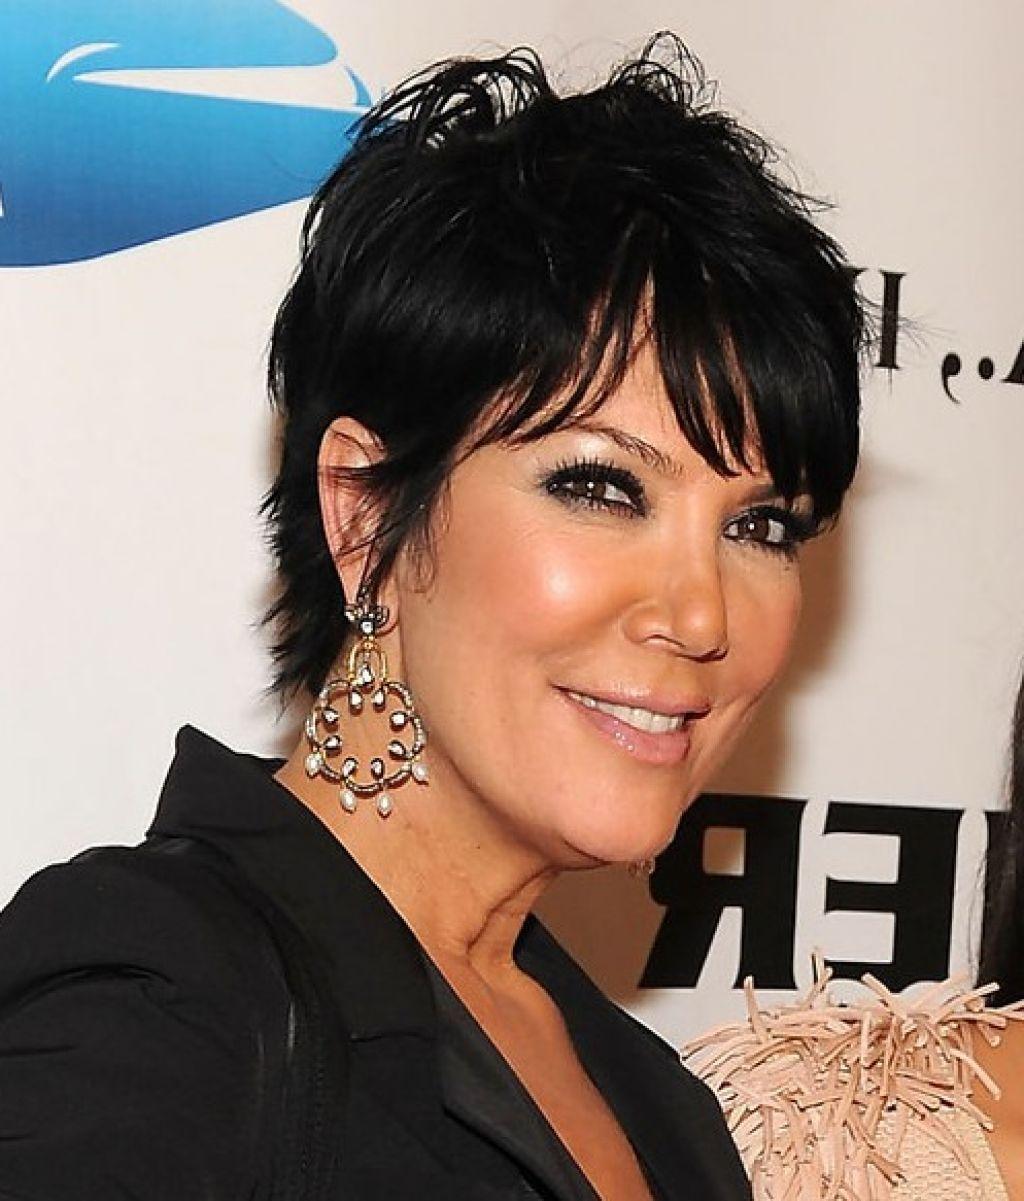 Kris Jenner Hairstyle Short Hairstyles 54deae3dbc346g Hair